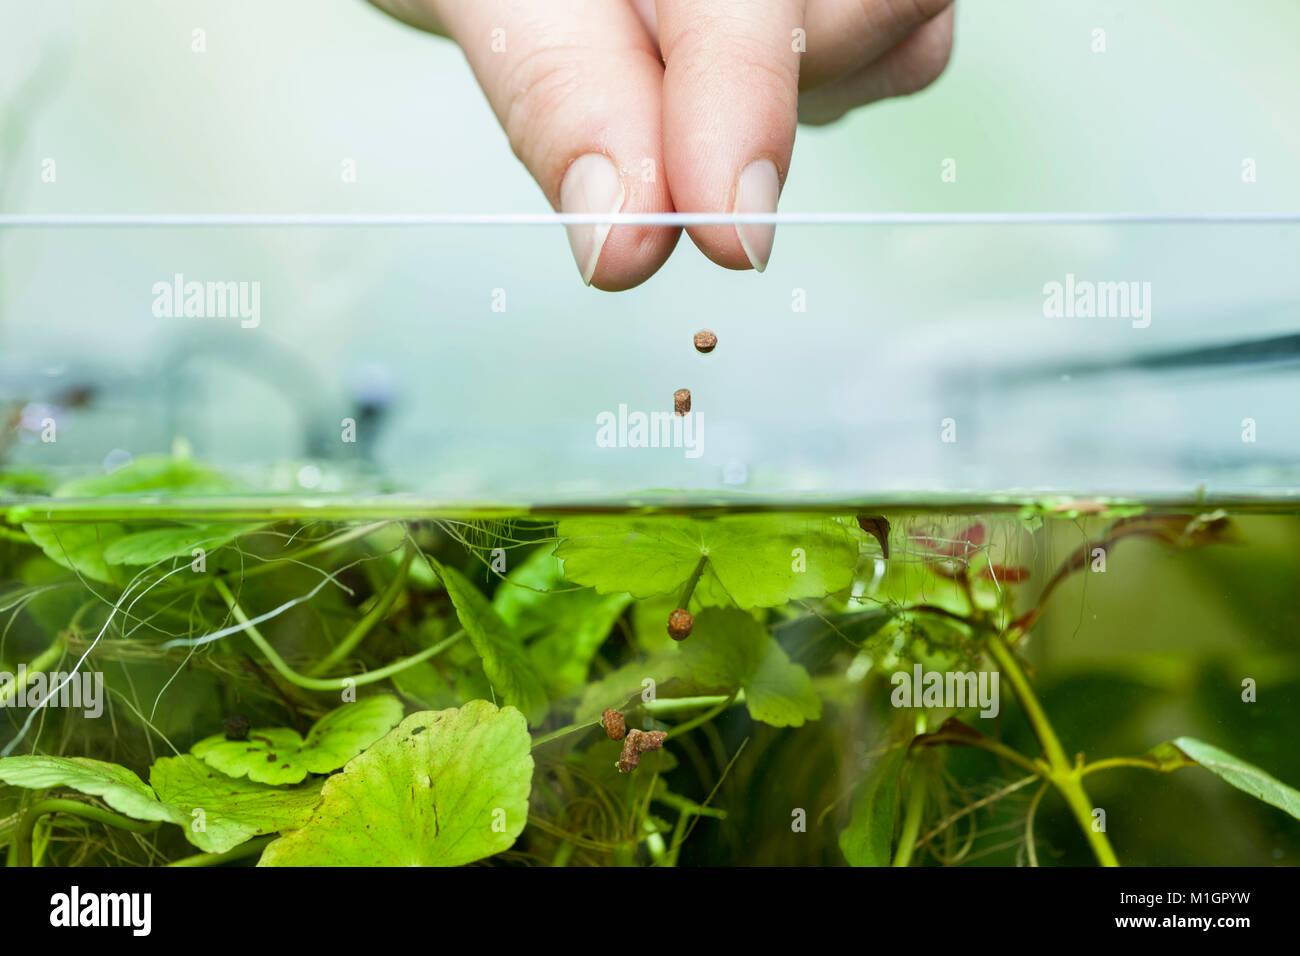 Feeding fish in a freshwater home aquarium . - Stock Image